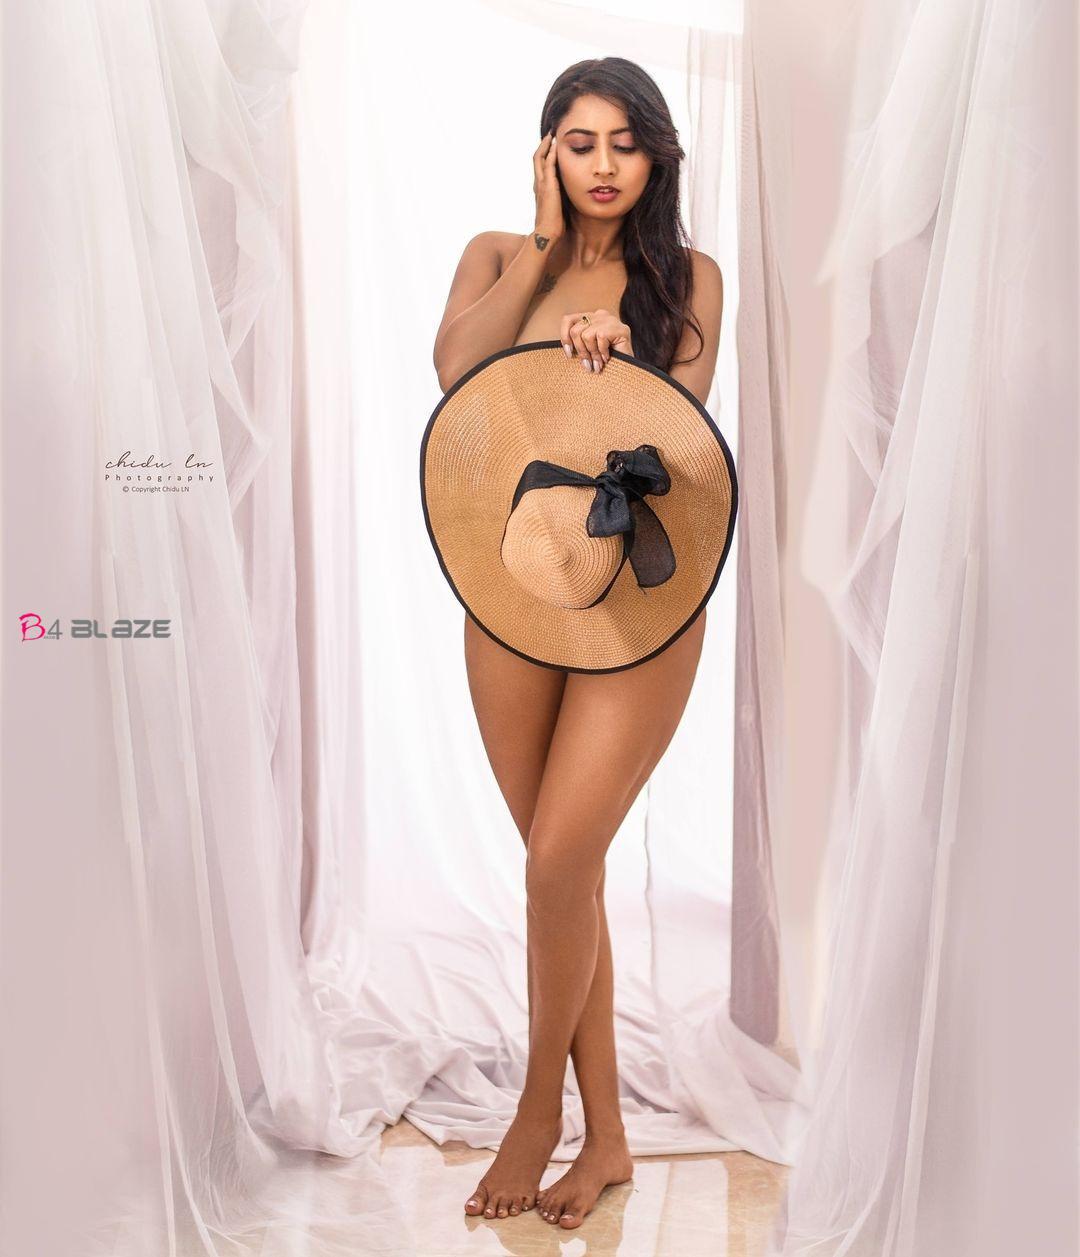 Actress Shubha Raksha's Hot photoshoot